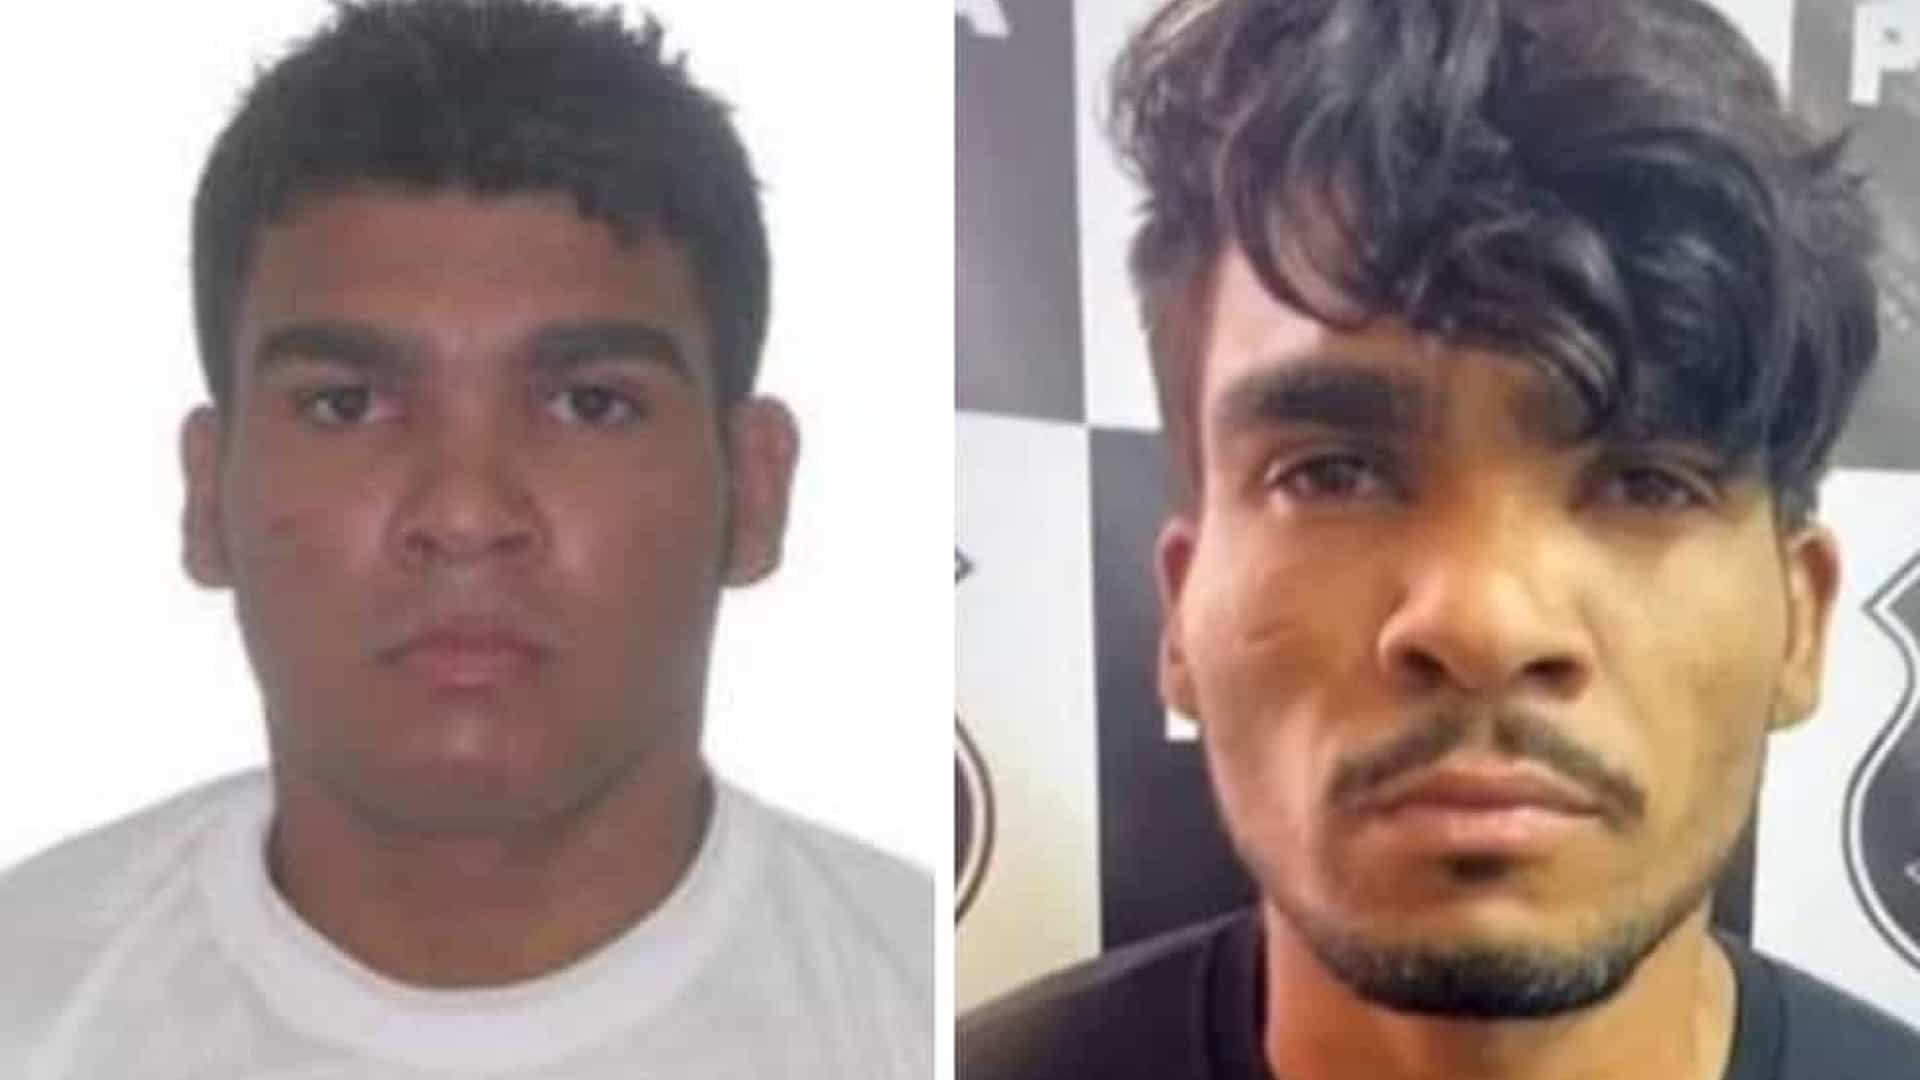 Polícia de Goiás indicia 5 por suposta ajuda a Lázaro Barbosa